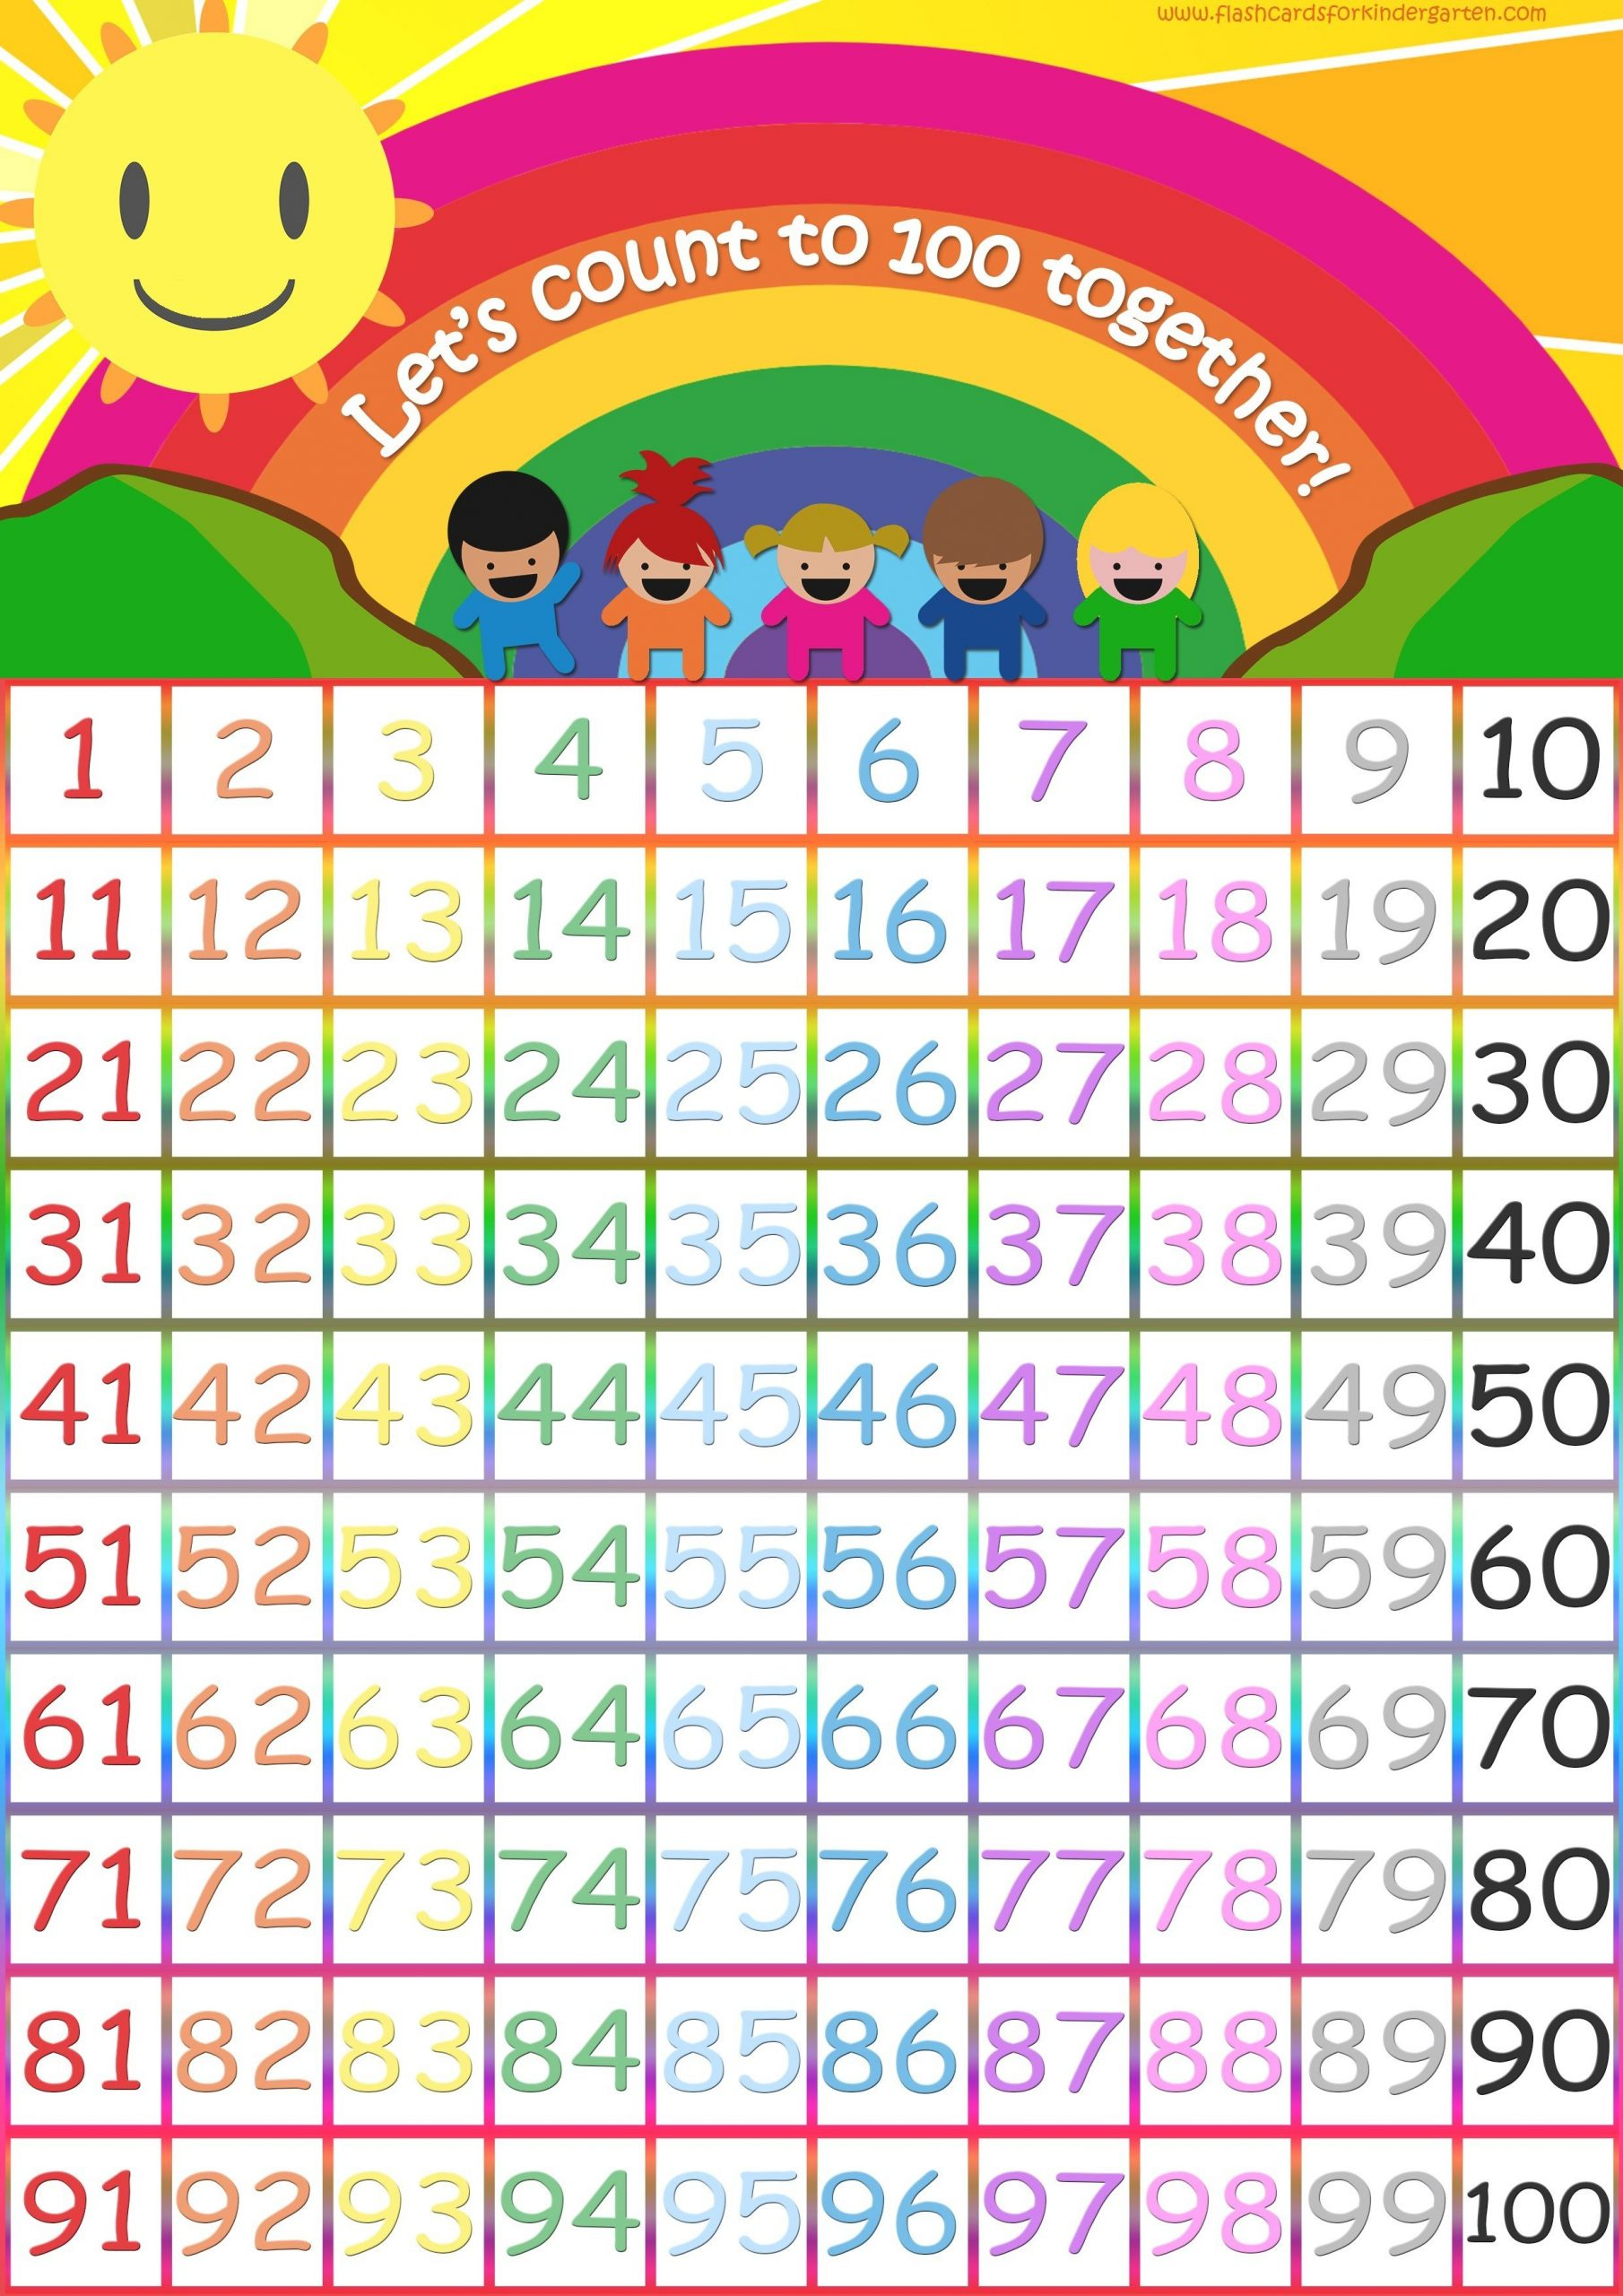 Free Printable Number Flashcards 1 30 | Free Printable Free Printable Numbers Flashcards 1 To 31